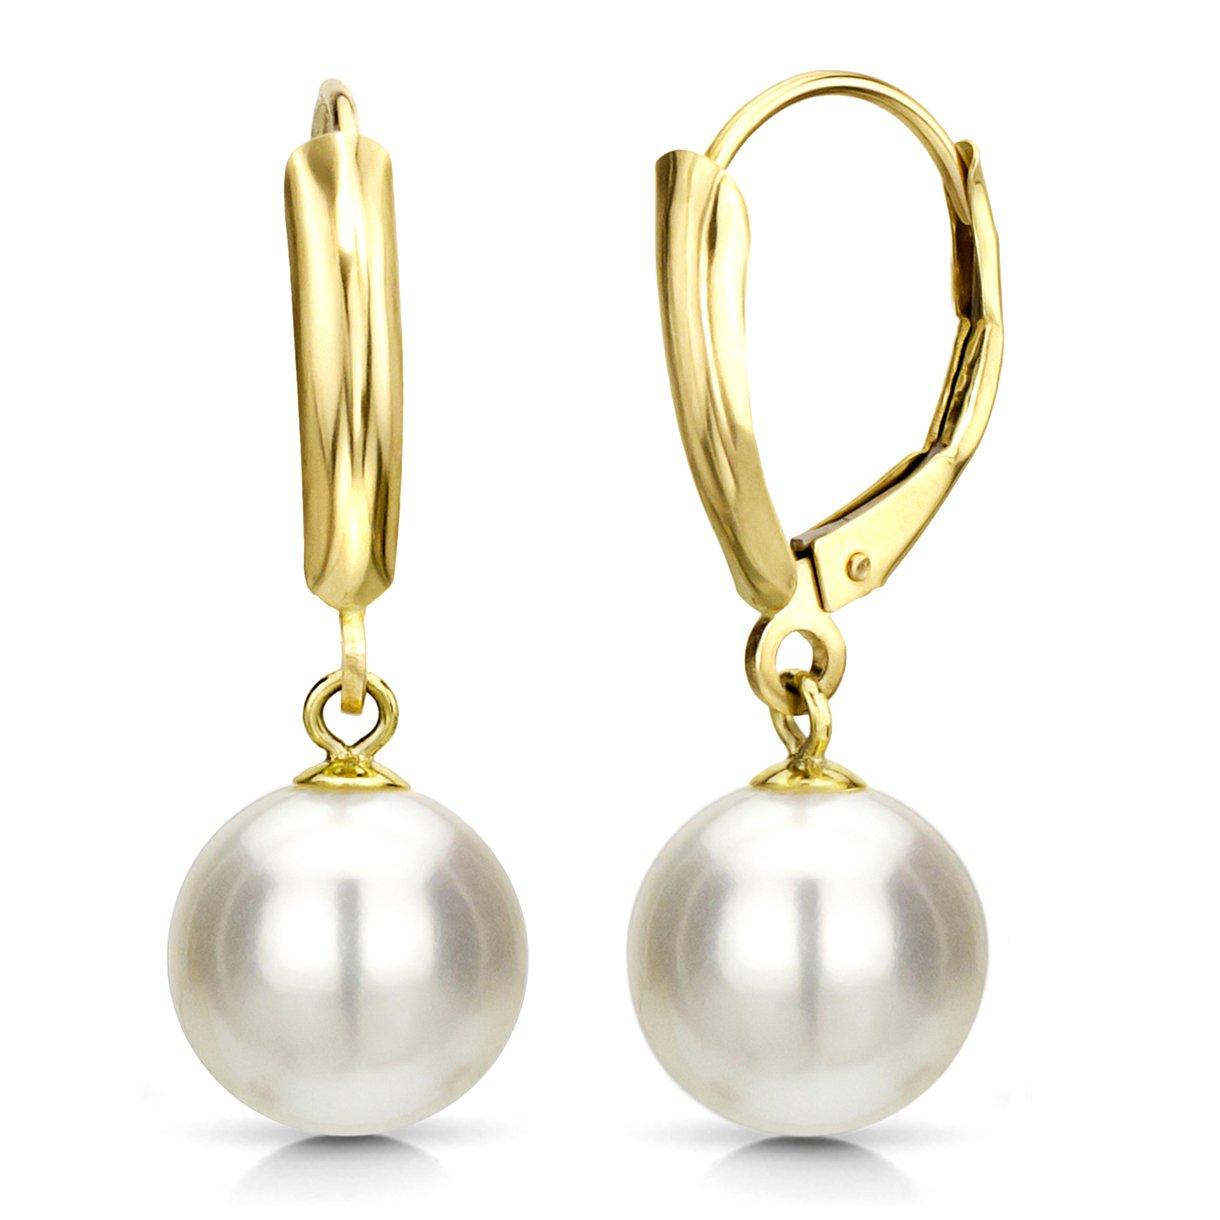 White Freshwater Cultured Pearl Earrings Dangle Leverback 14K Yellow Gold Wedding Gift 7-7.5mm by La Regis Jewelry